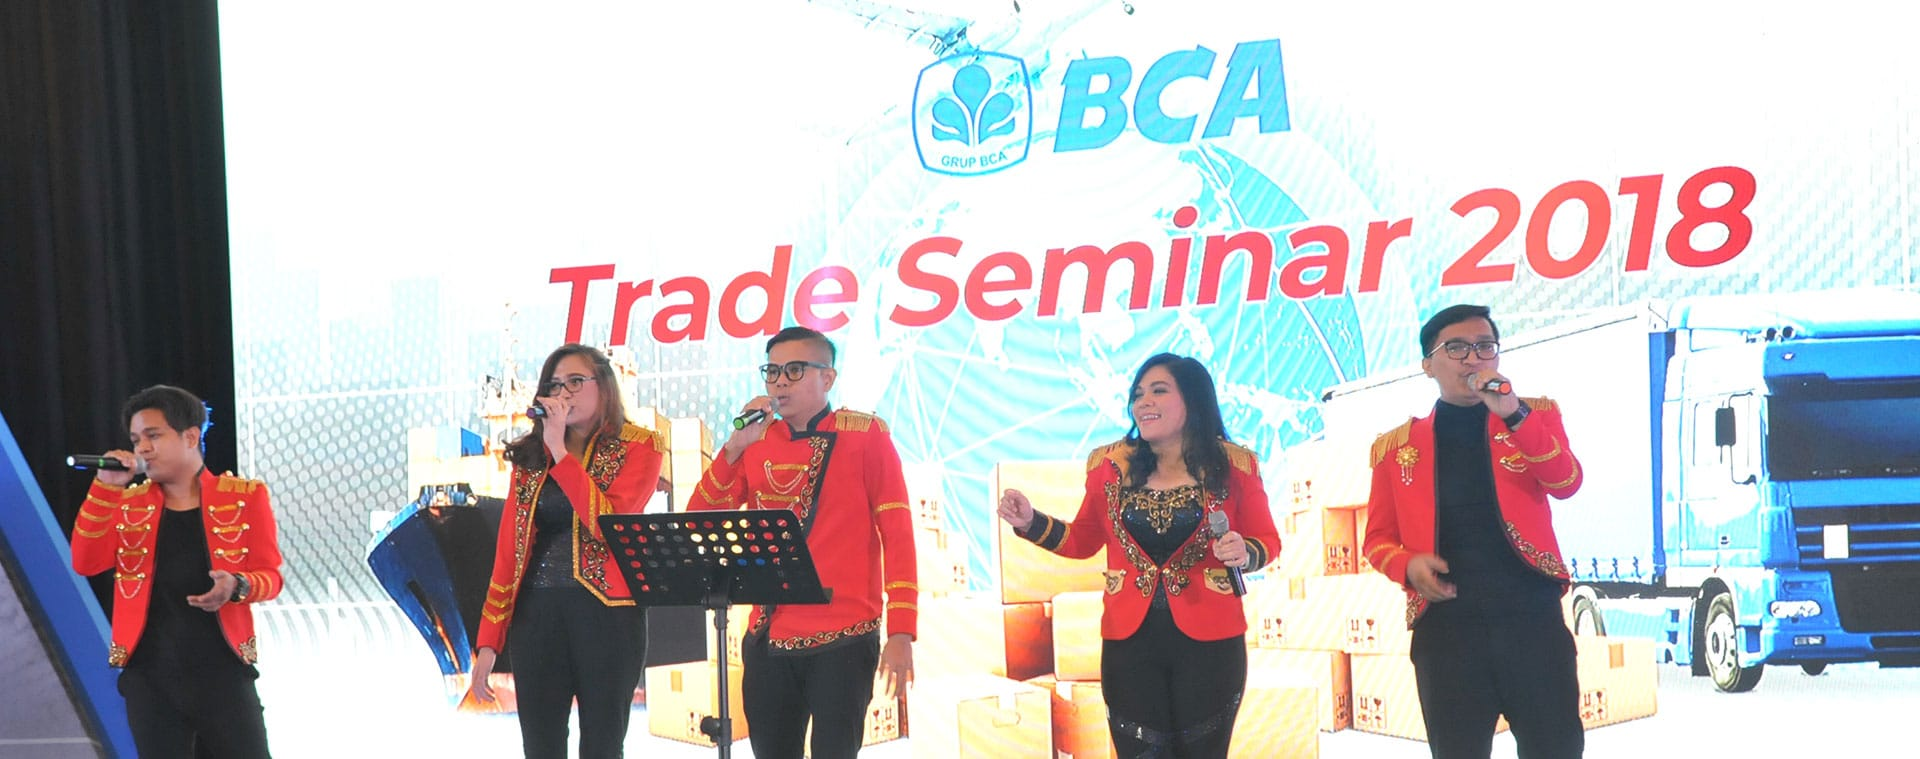 BCA Trade Seminar Event